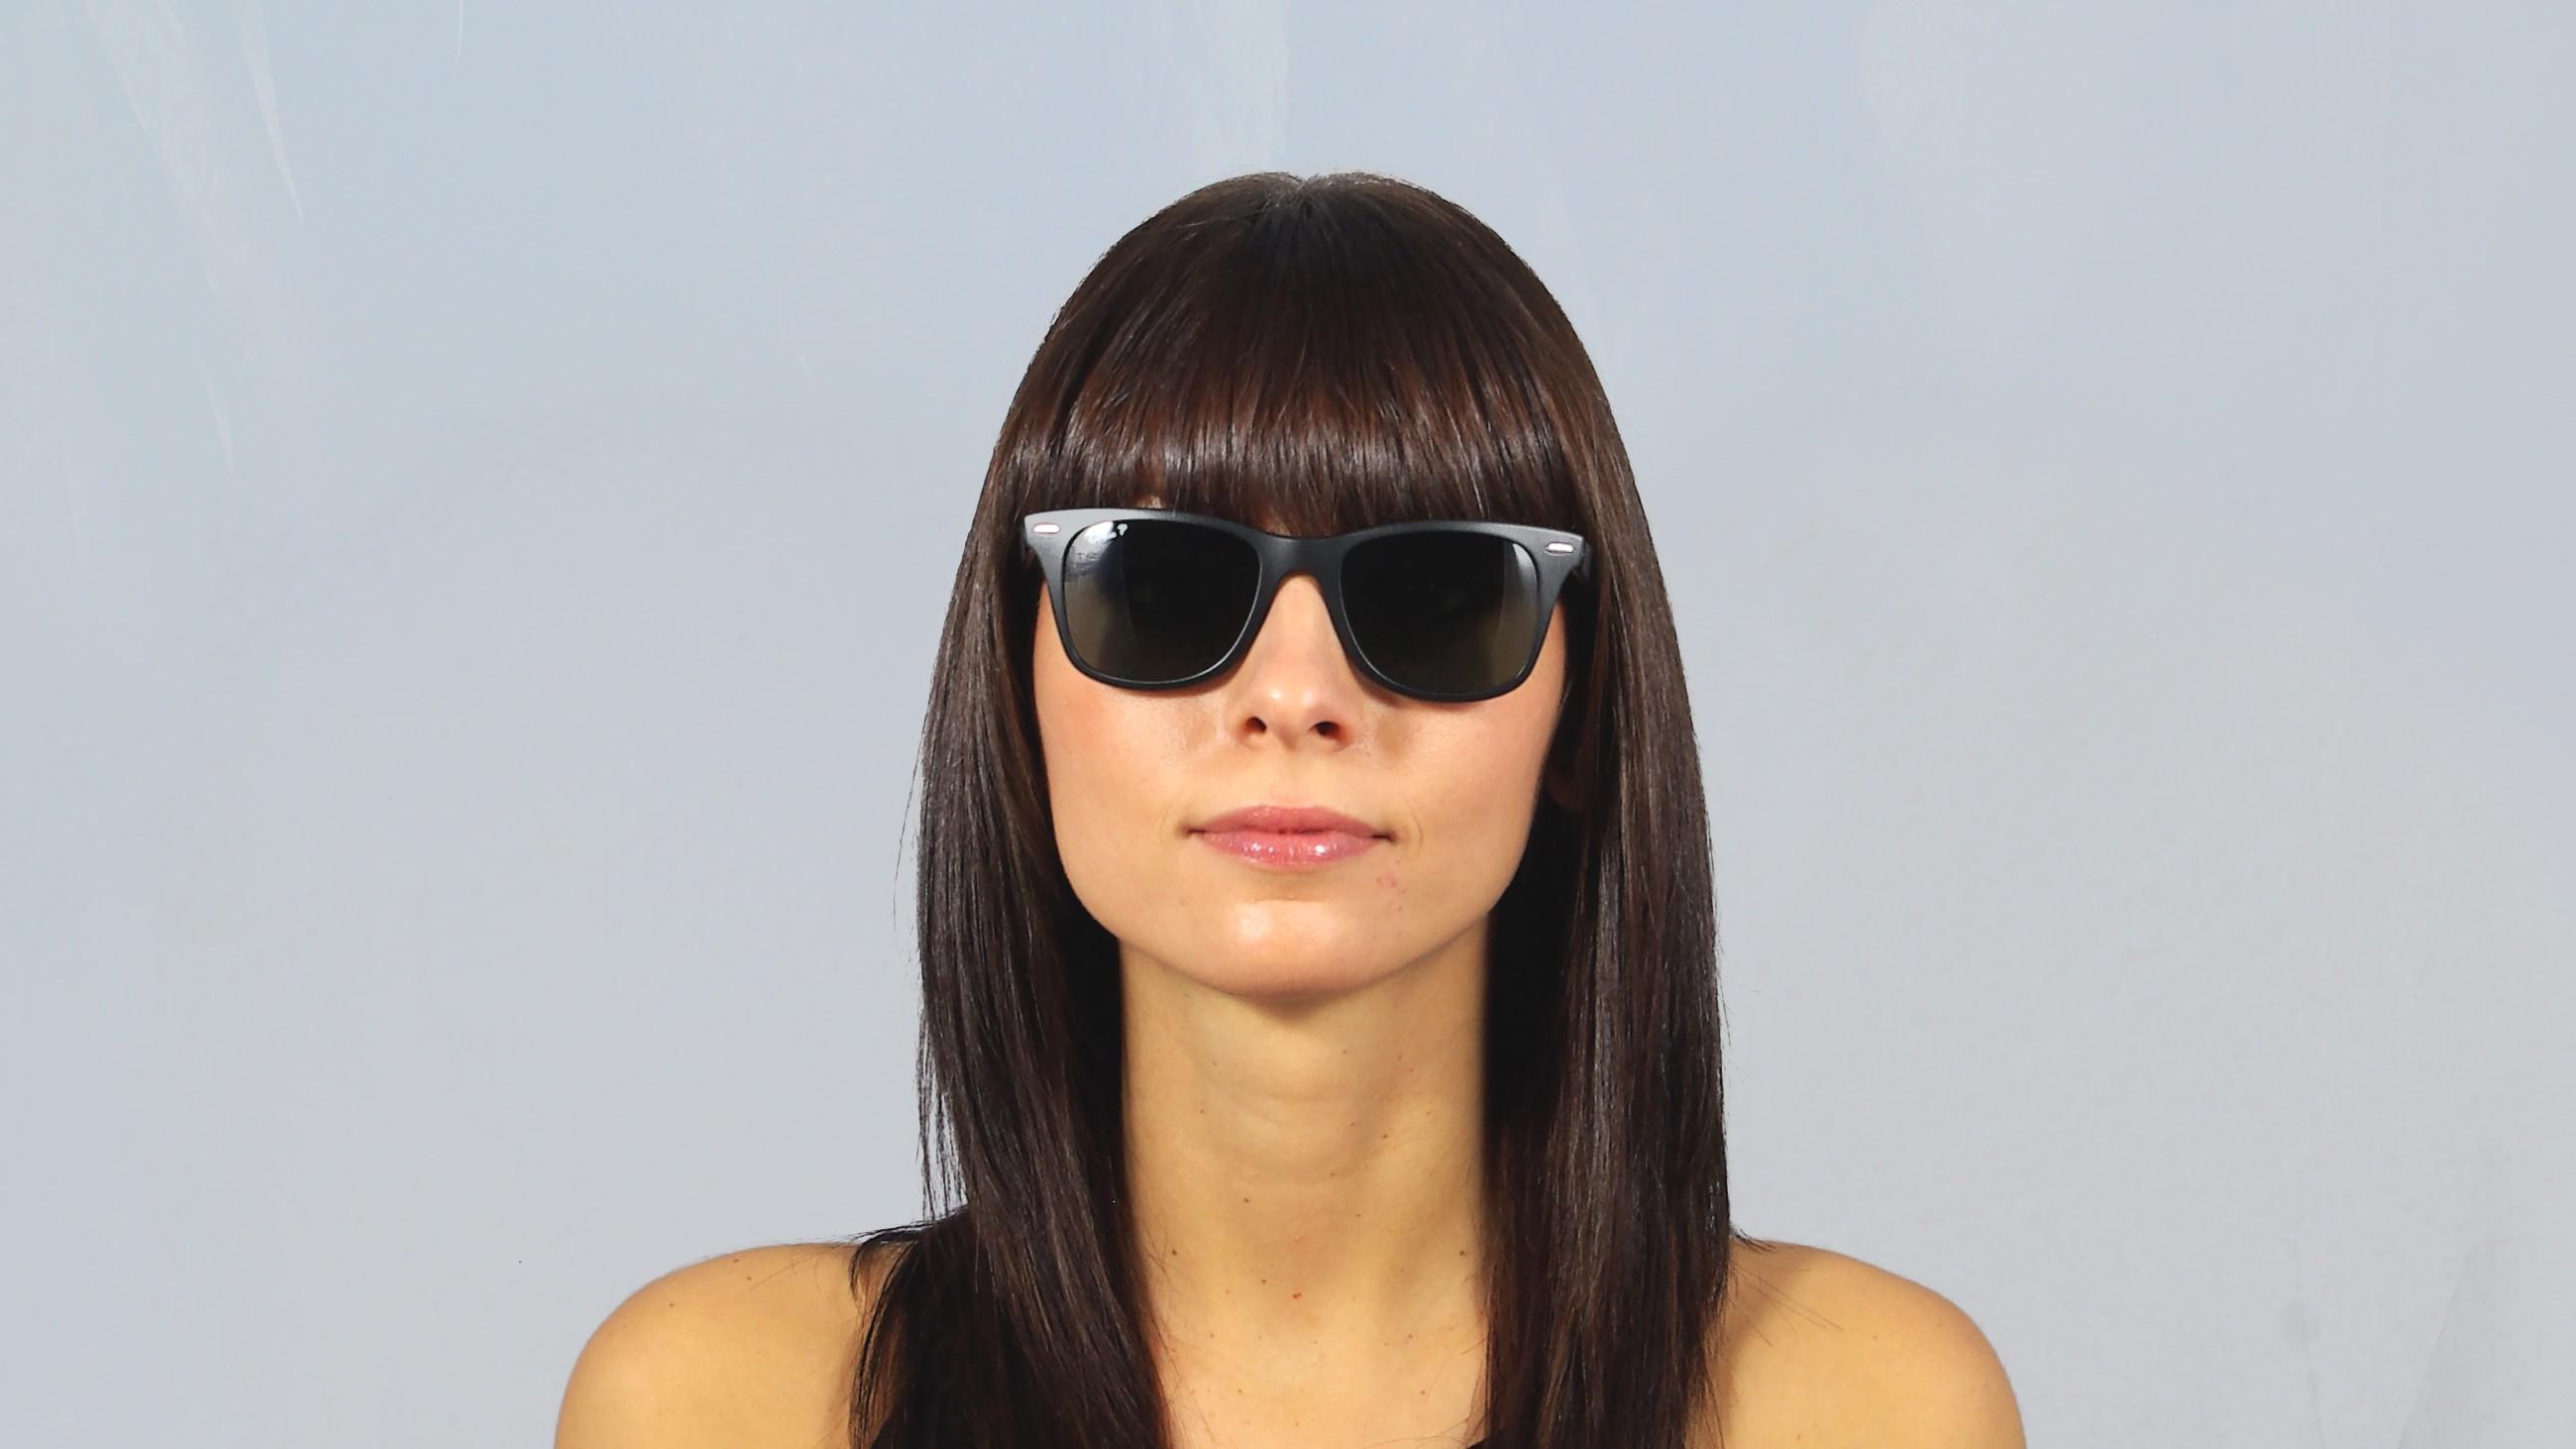 5447ef24e Sunglasses Ray-Ban Wayfarer Liteforce Black RB4195 601S/9A 52-20 Medium  Polarized